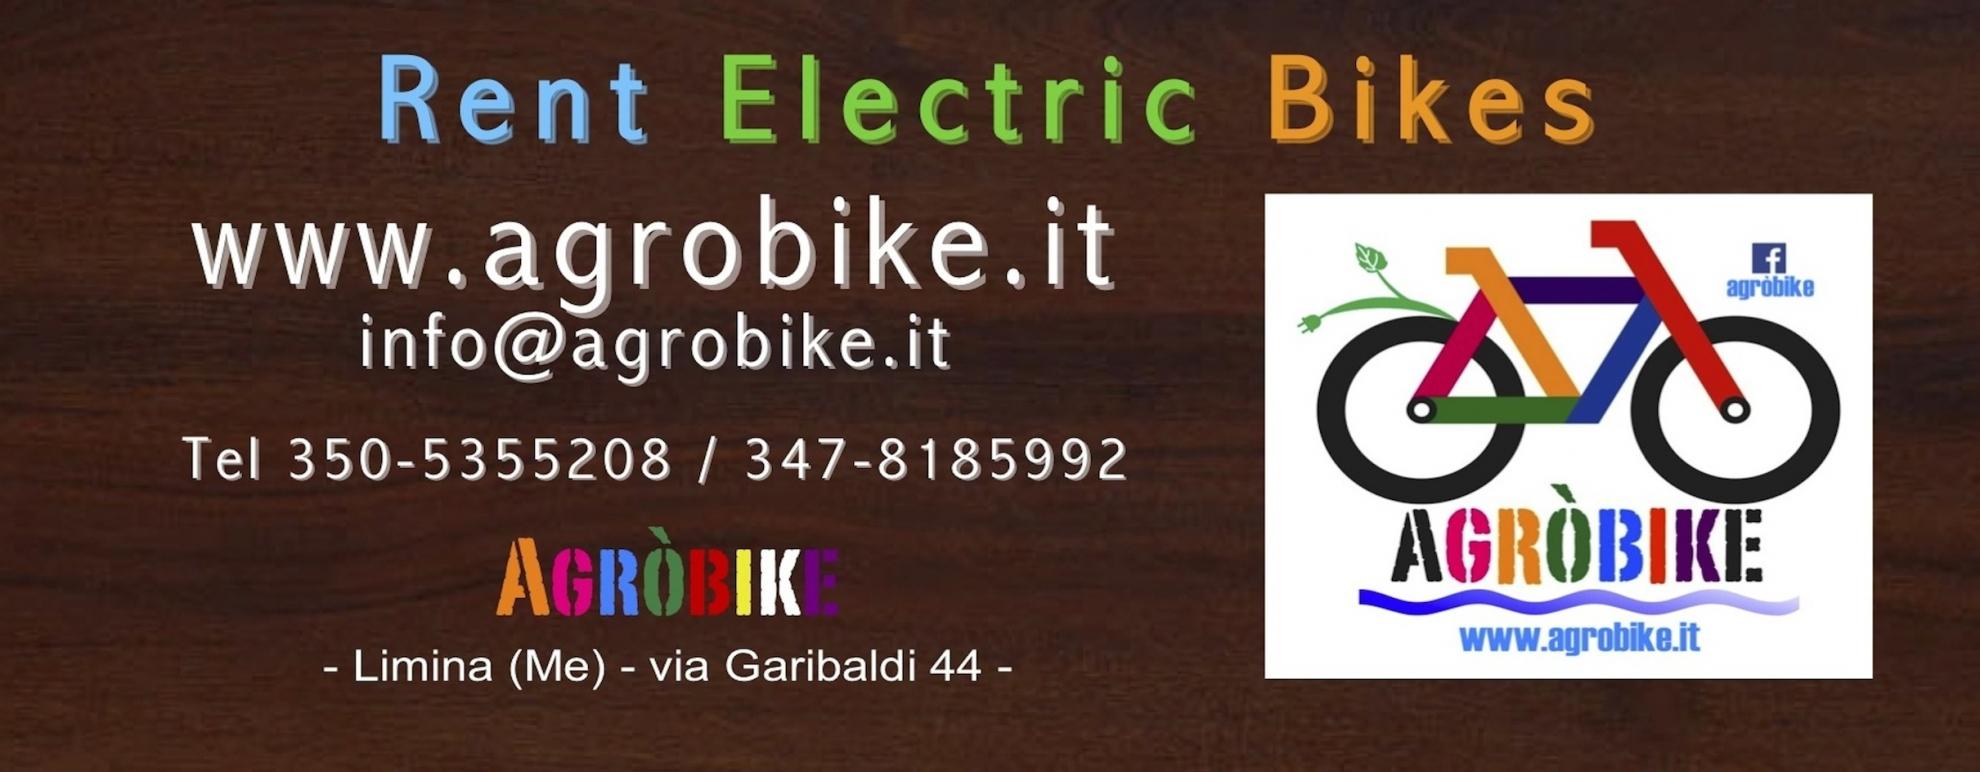 Agrobike - Noleggio Bici, Limina